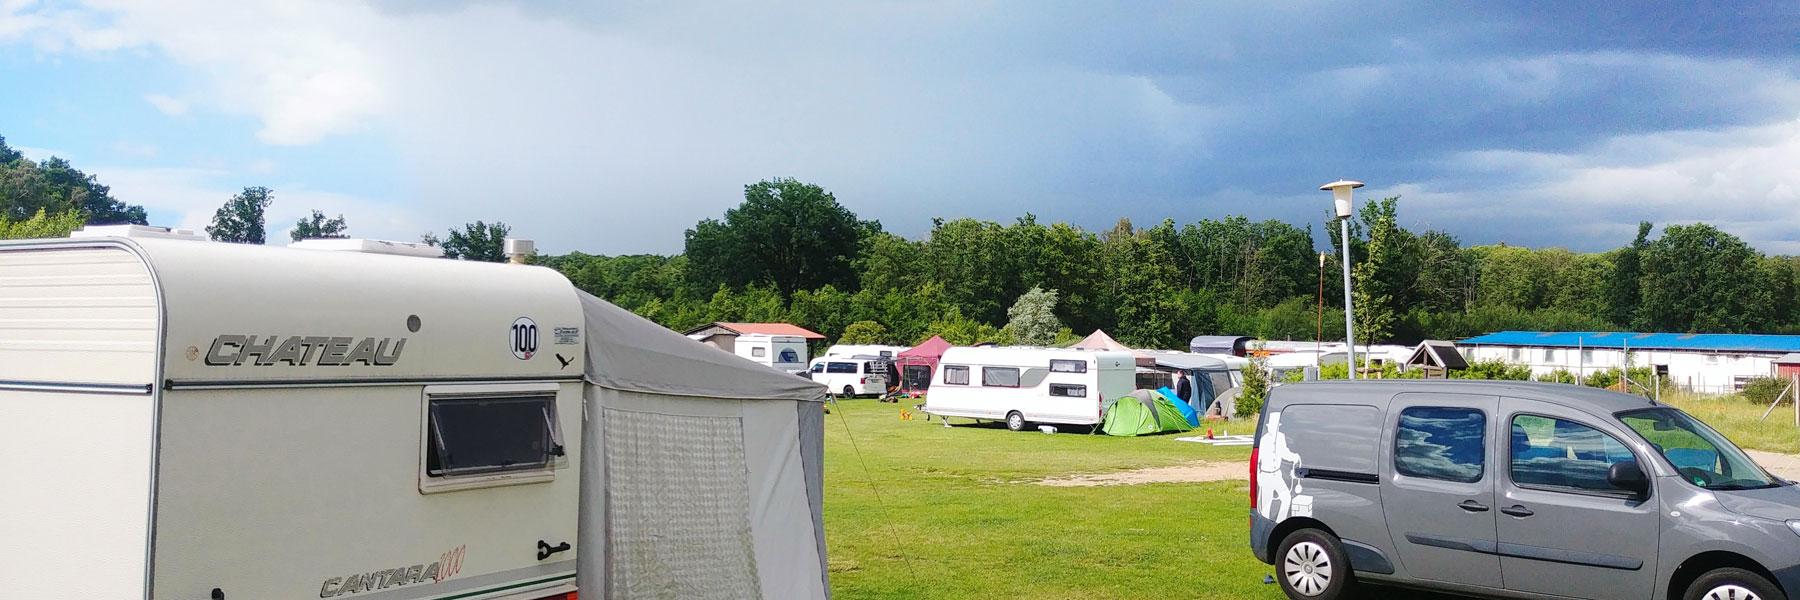 Wohnmobile - Camping Sabines Bauernhof